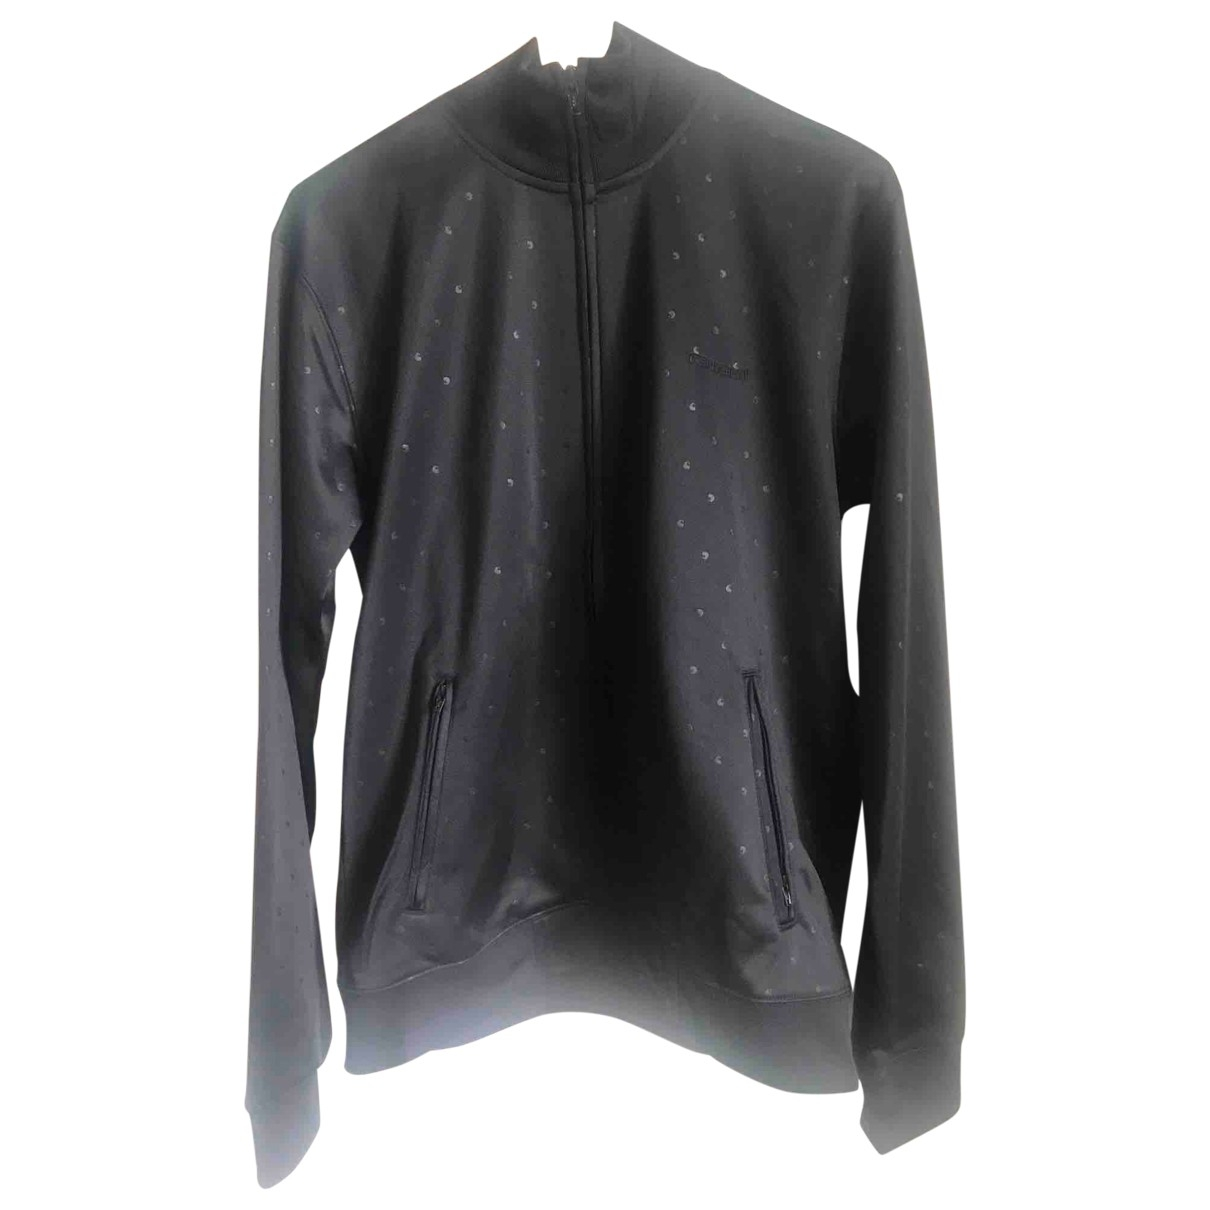 Carhartt \N Black jacket for Women L International